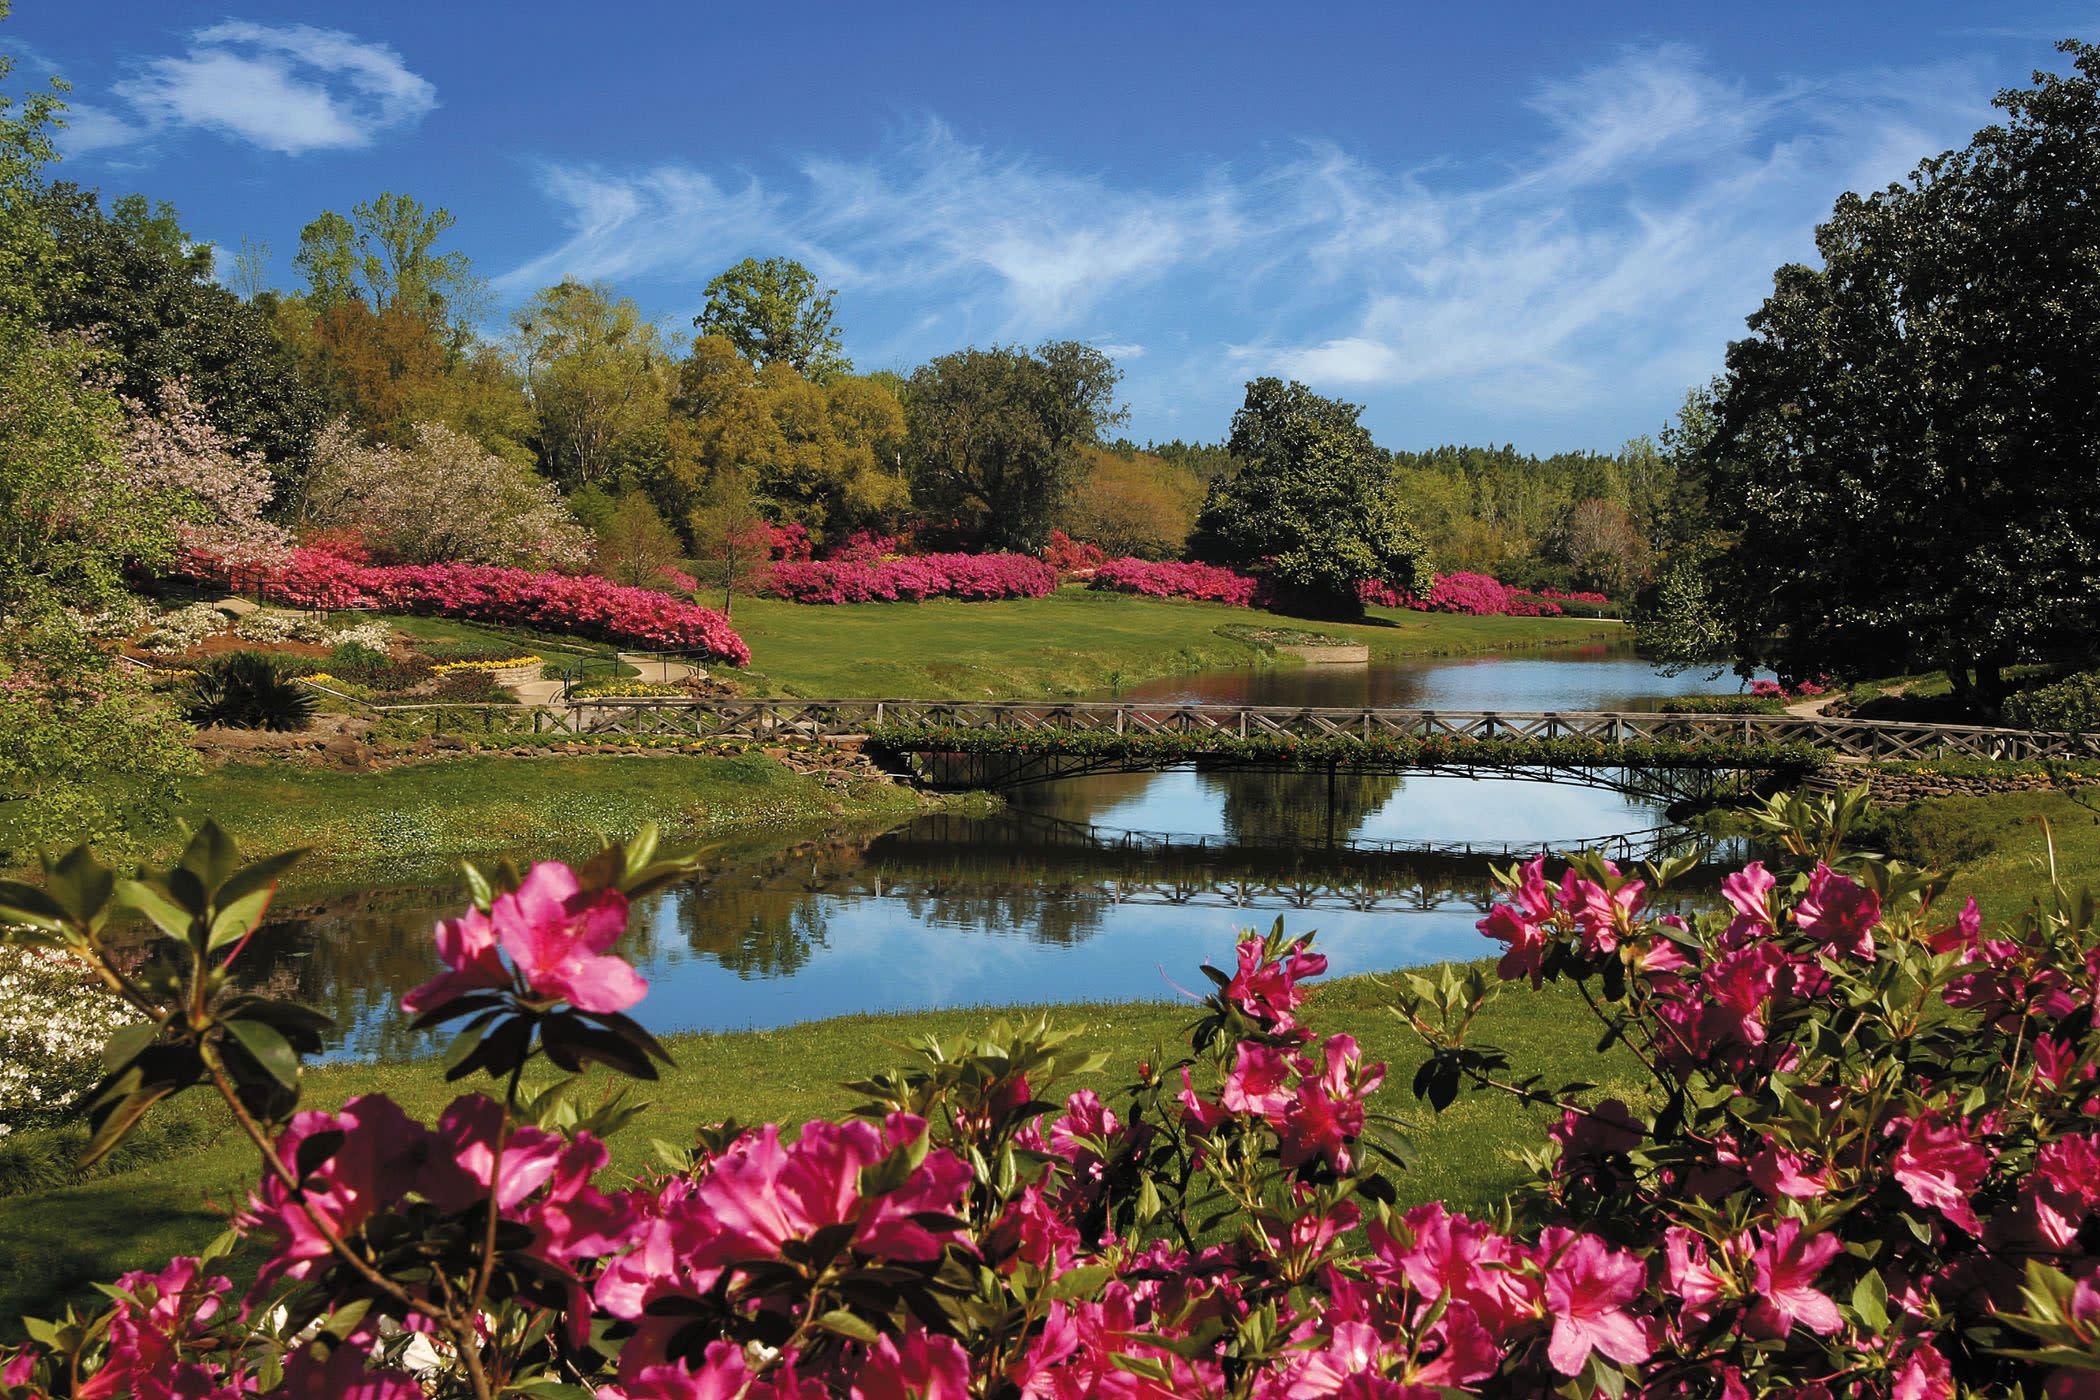 Bellingrath Gardens Mirror Lake Azaleas